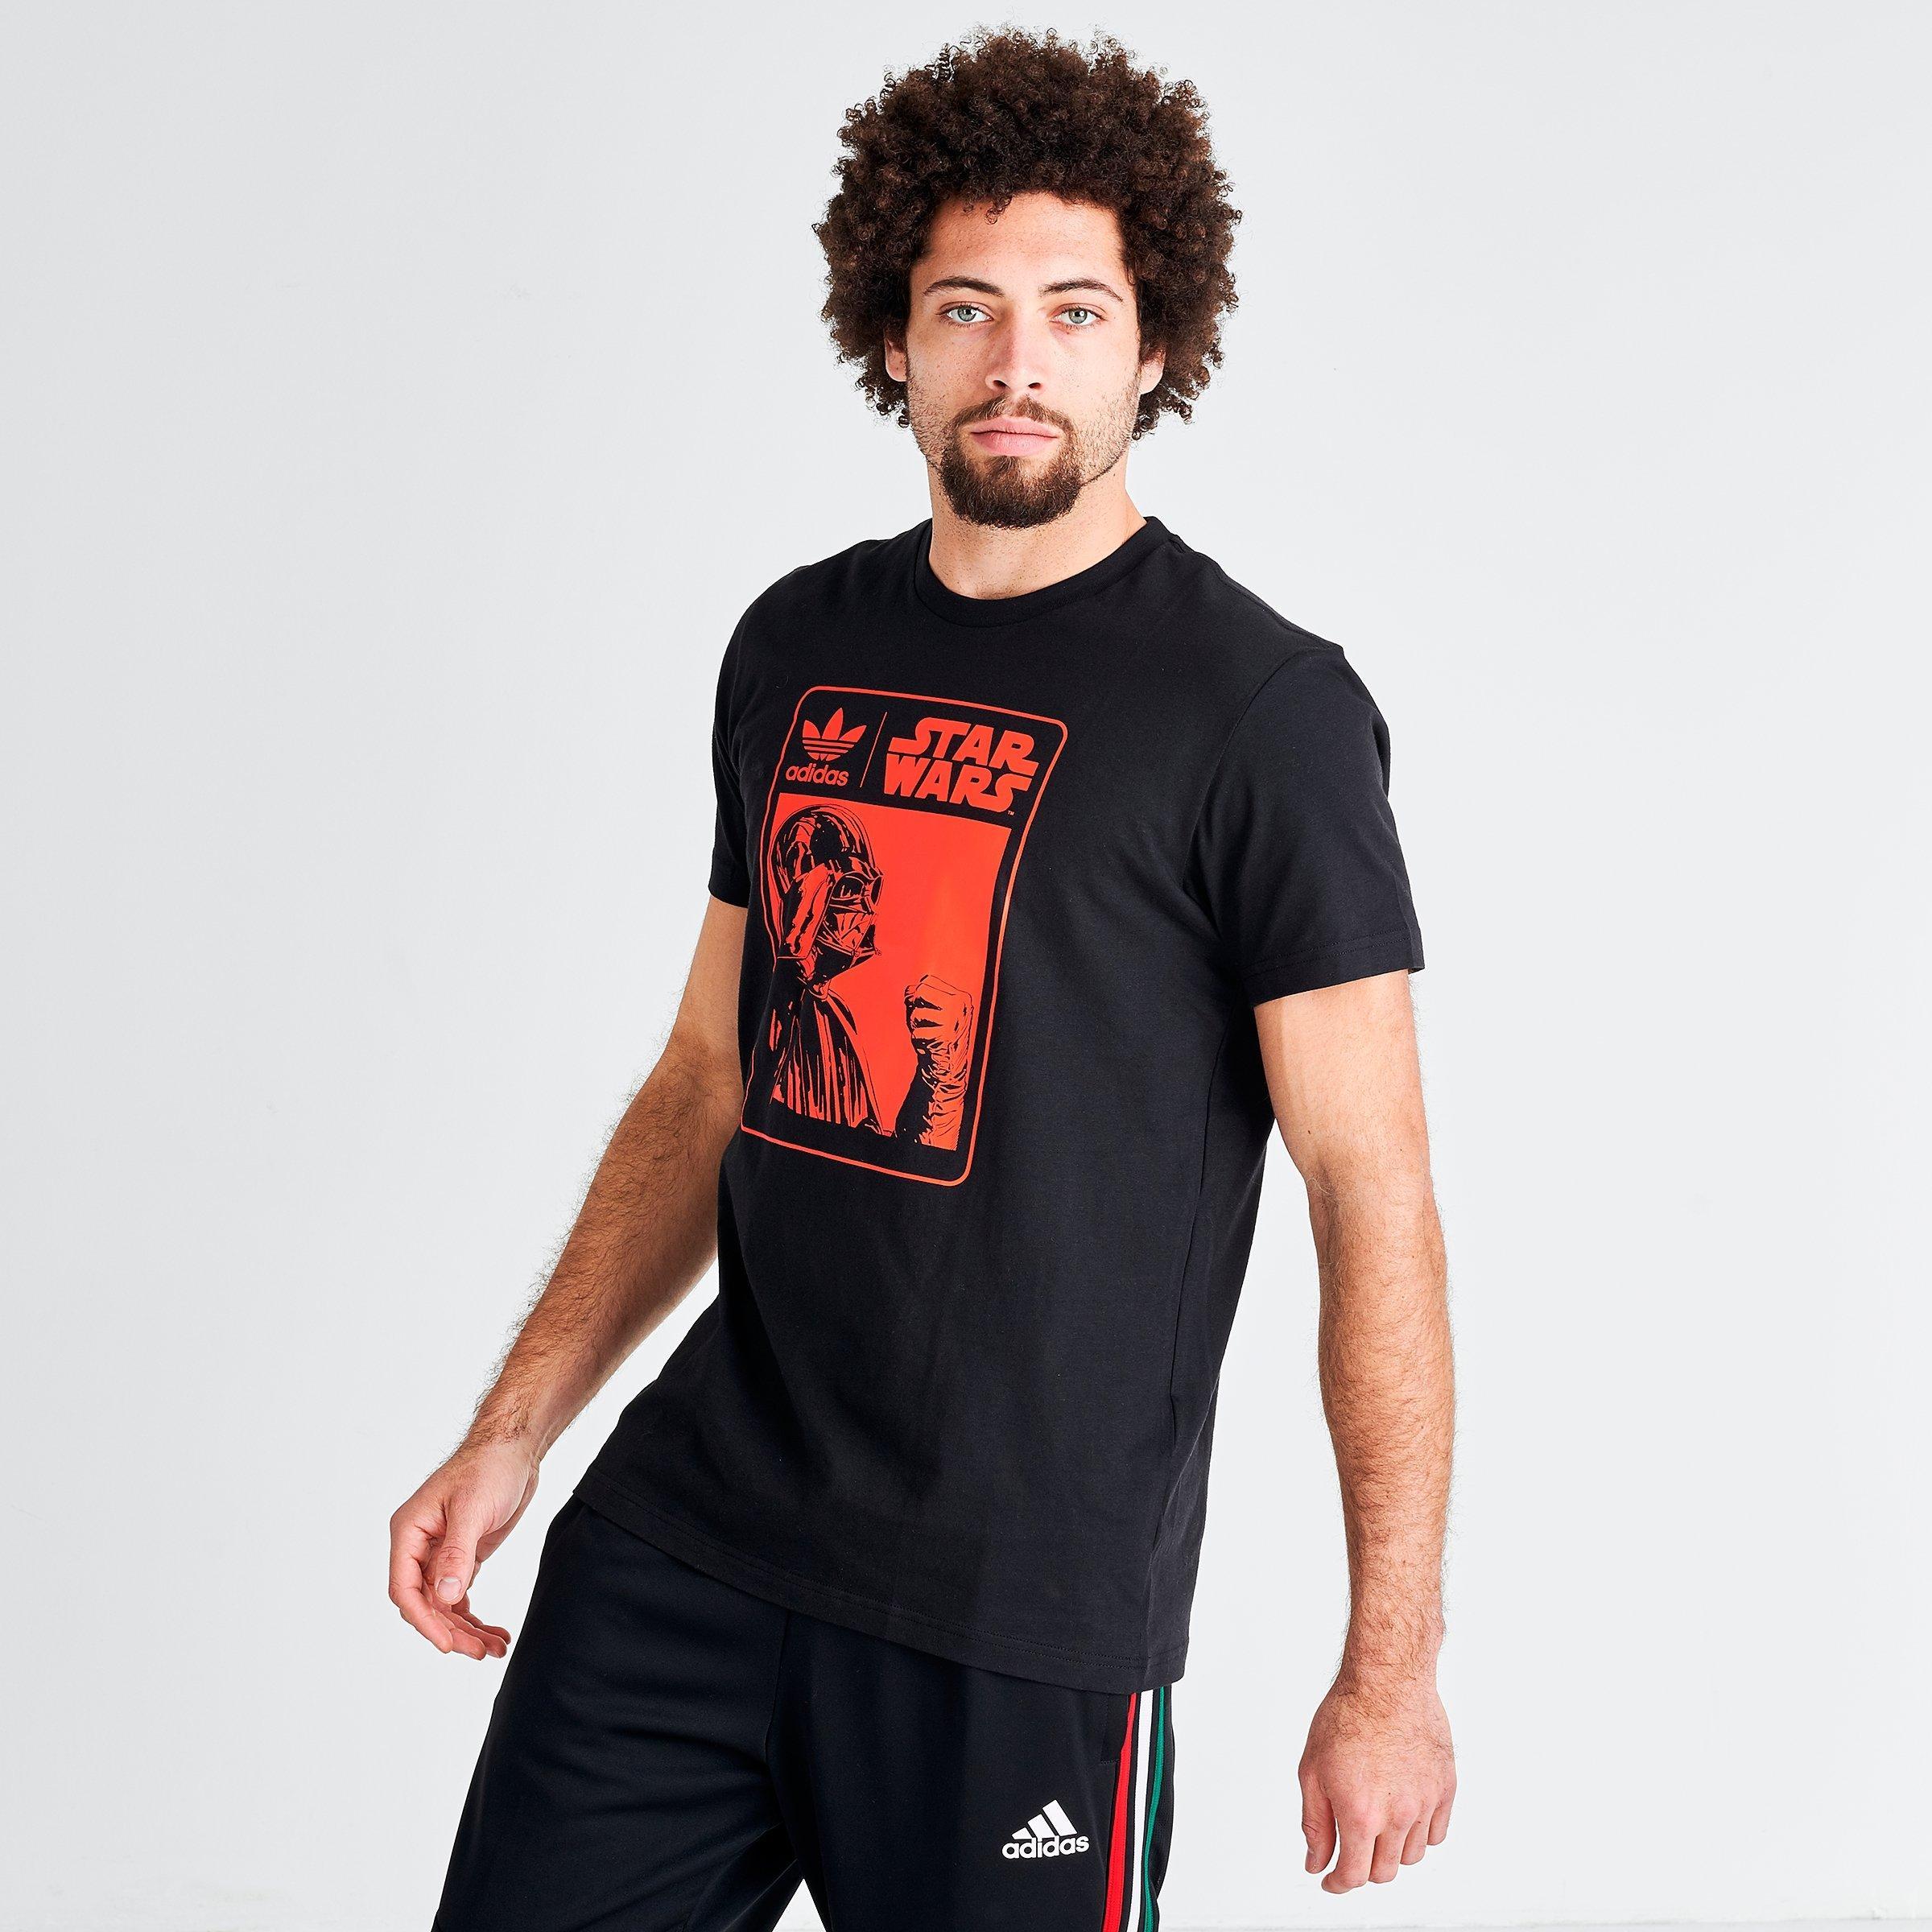 adidas star wars darth vader t shirt black